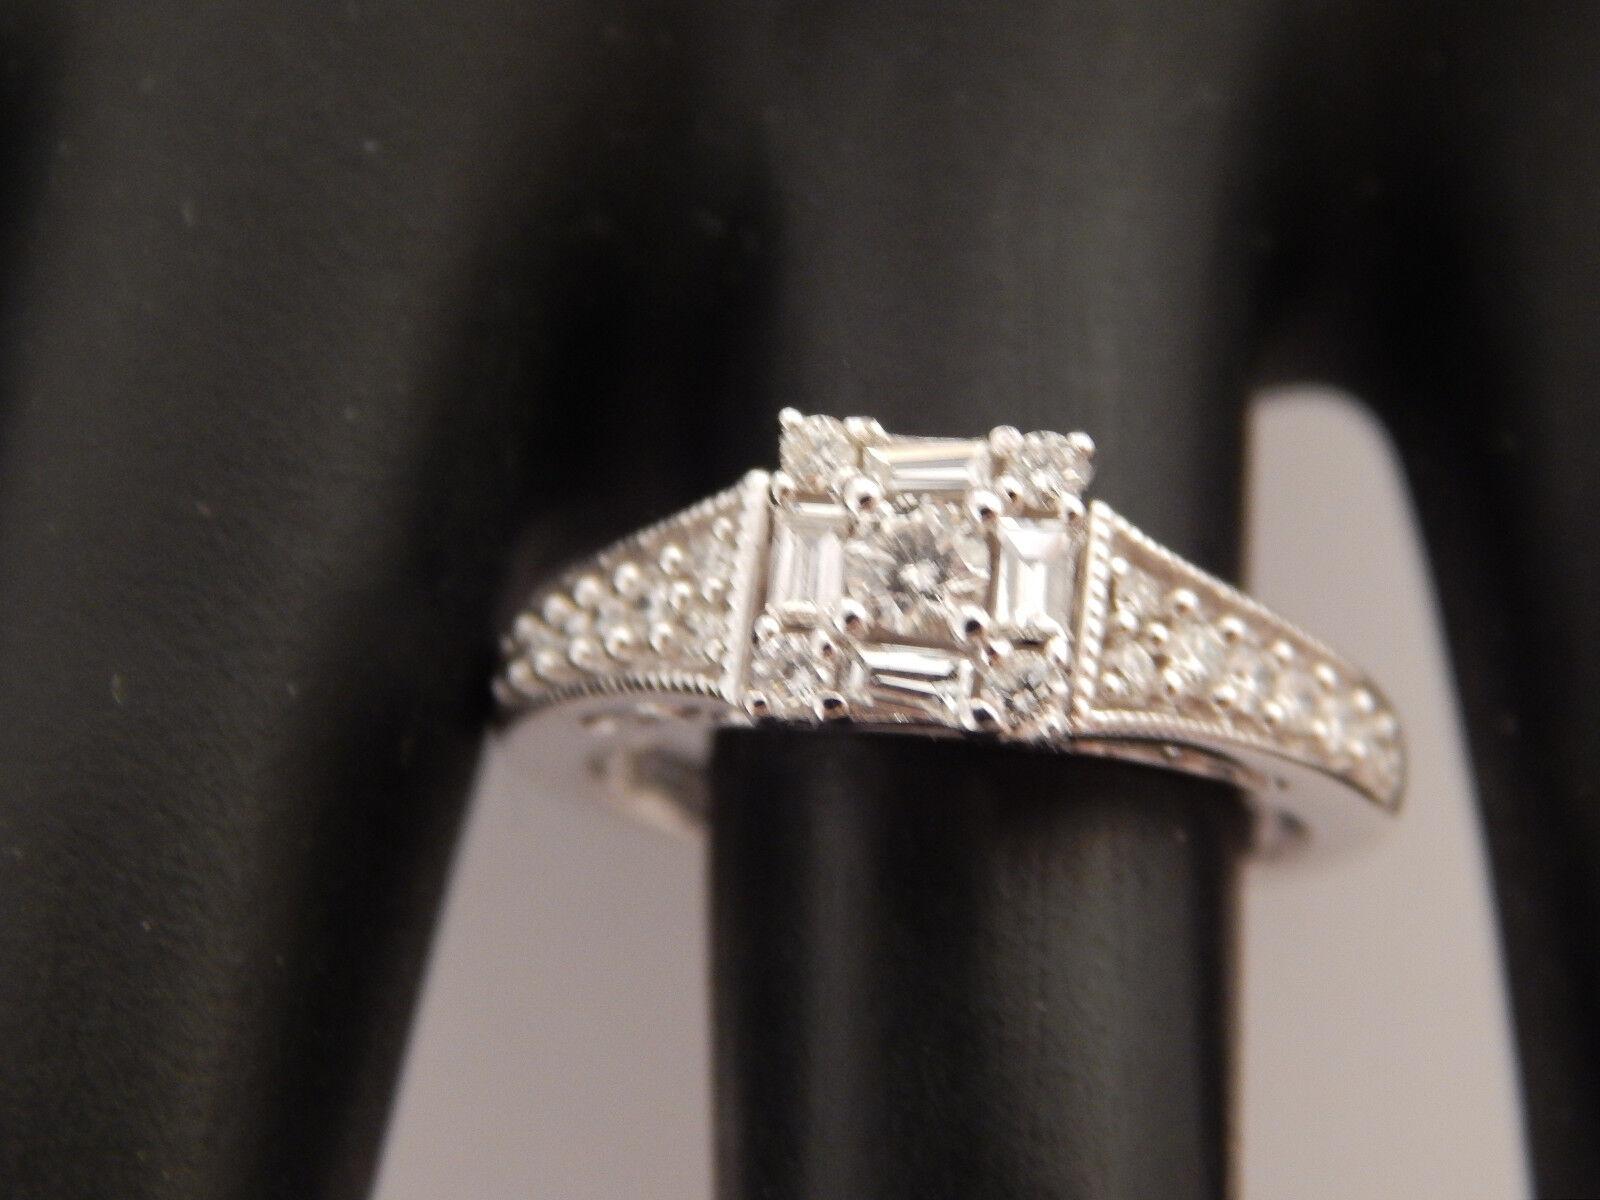 .75 Keepsake Illusion Mix Cuts Diamond Engagement Ring Designer 14k WG G SI